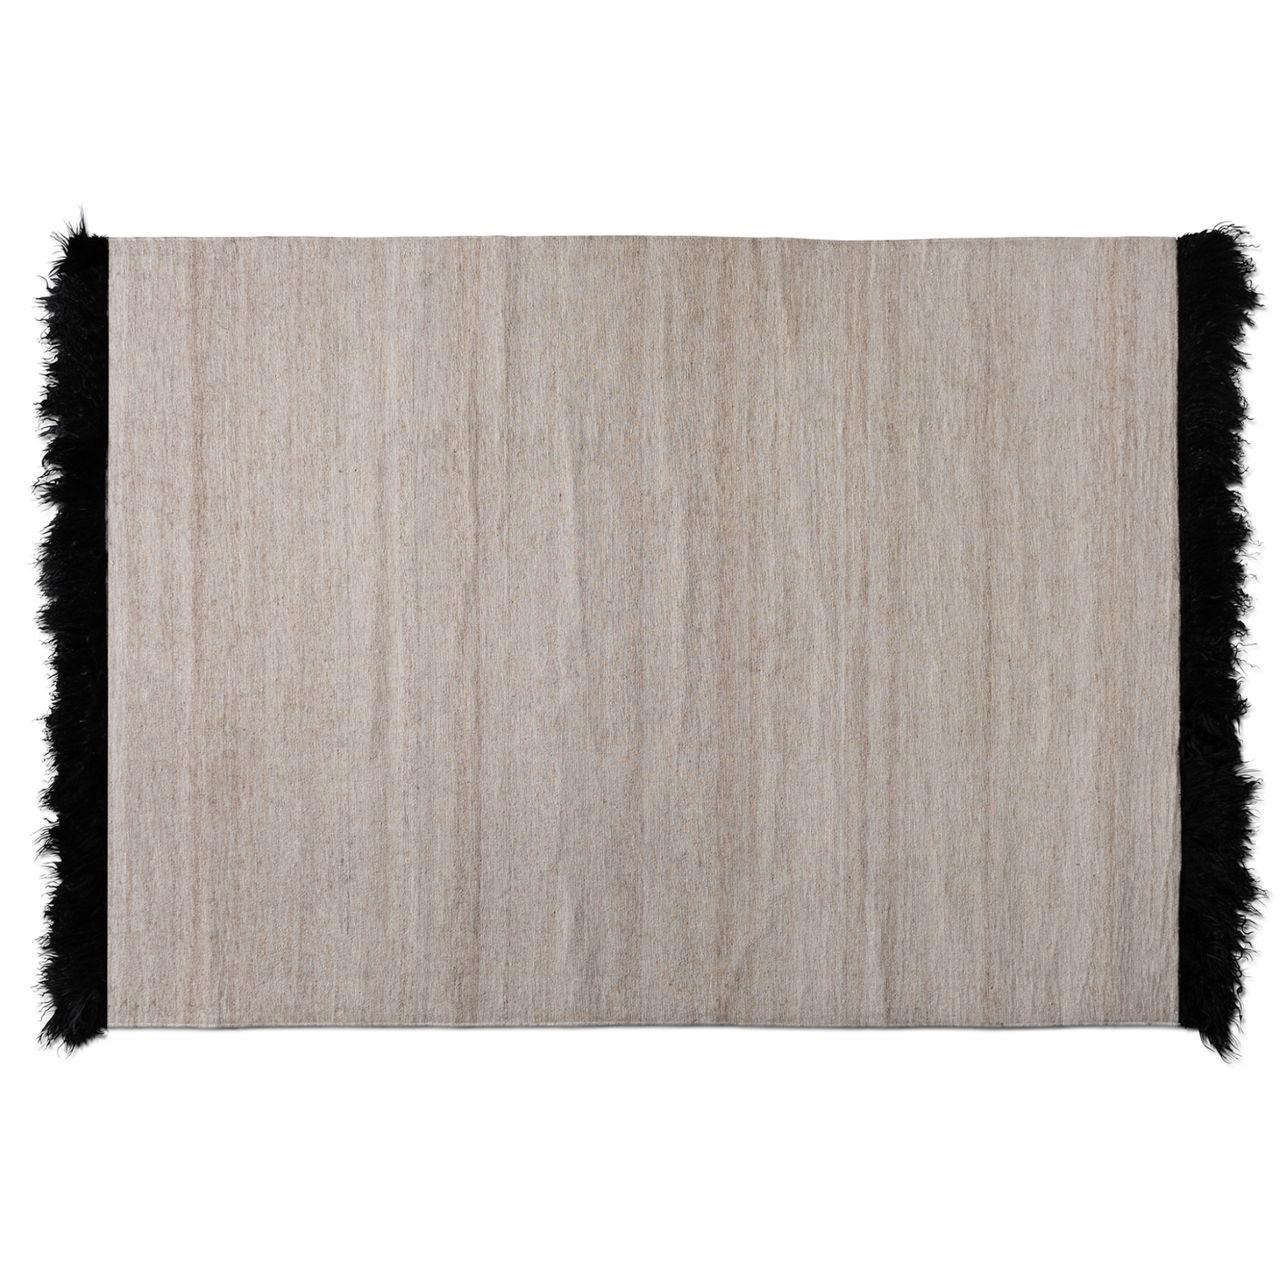 Baxton Studio Dalston Beige/Black Handwoven Wool Blend Area Rug